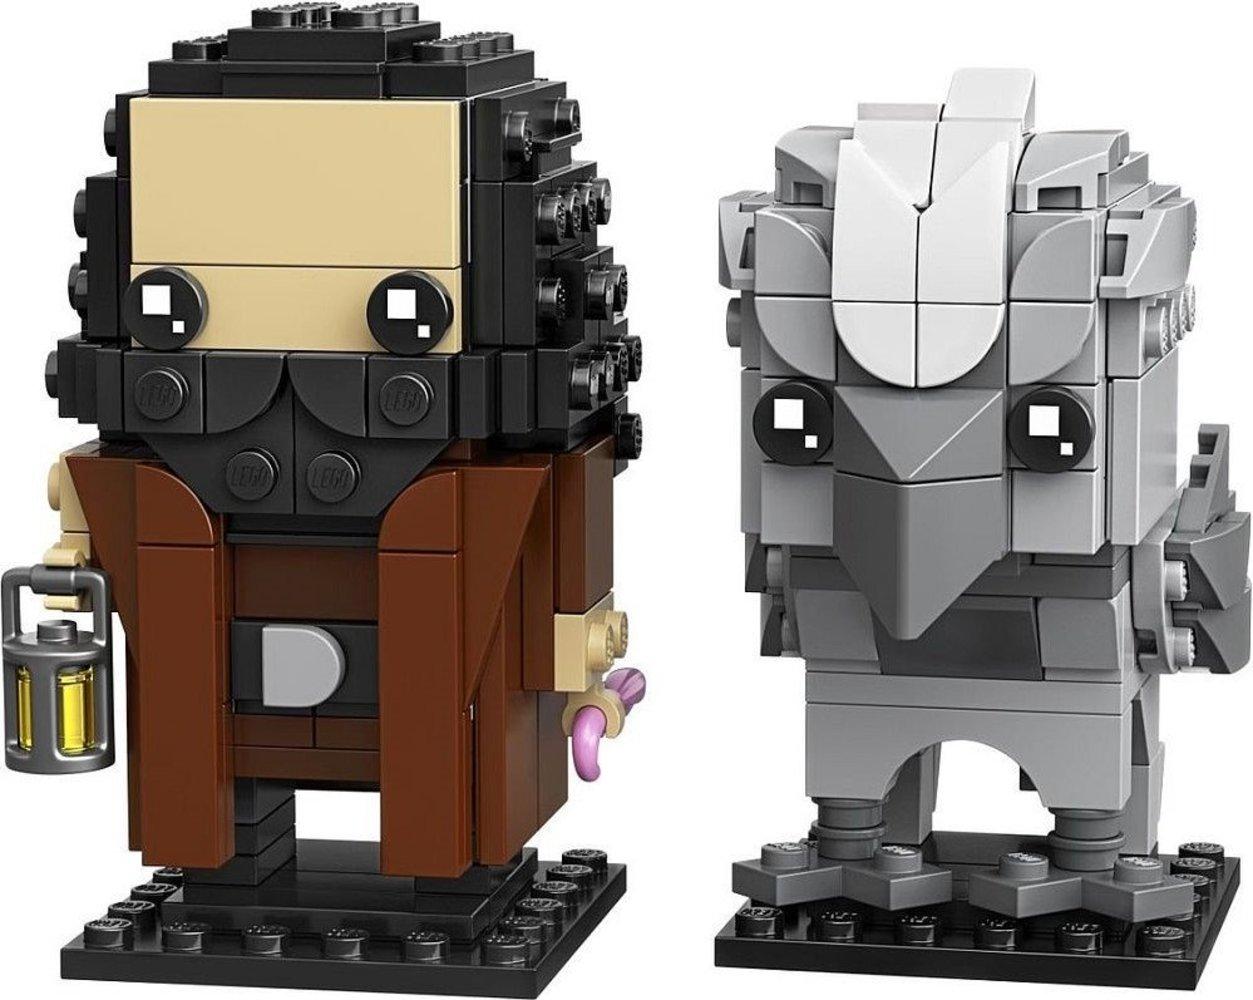 Hagrid & Buckbeak